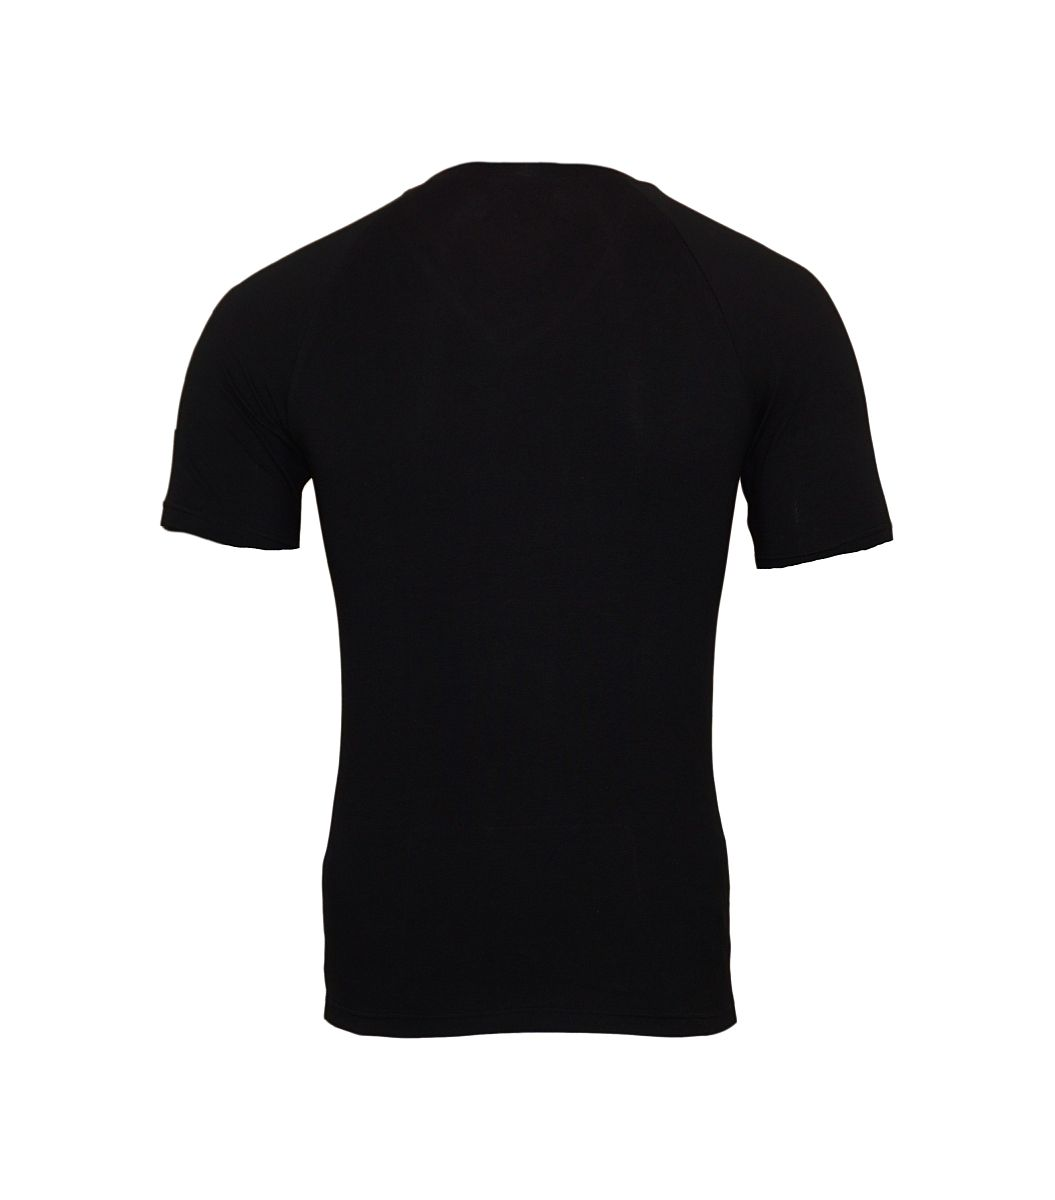 Emporio Armani T-Shirts V-Ausschnitt 111760 8P725 00020 NERO W18-EATS1